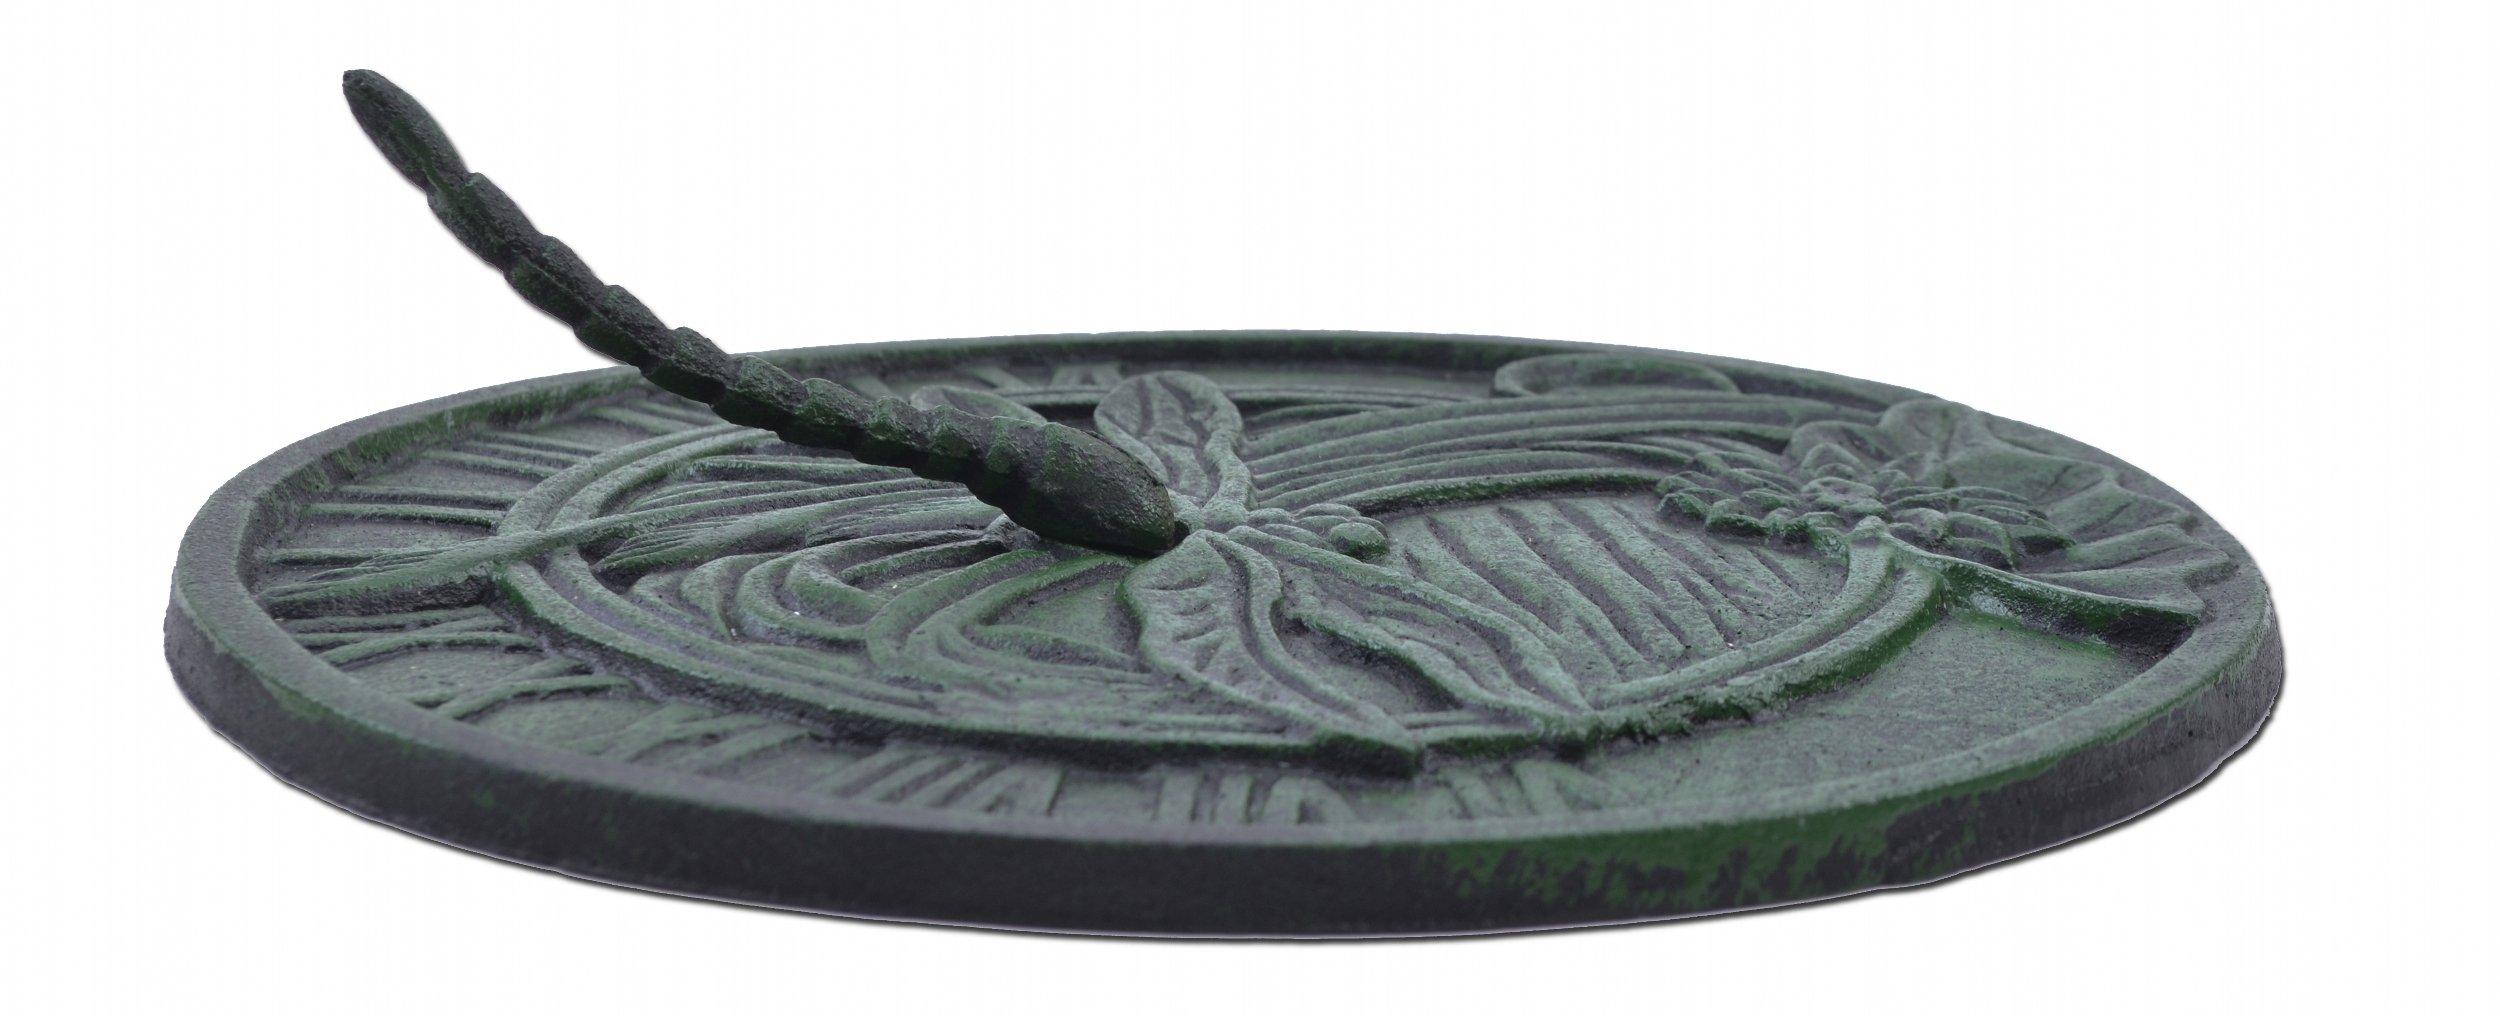 Import Wholesales Sundial Decorative Dragonfly Garden Plaque Green 9.75'' Wide